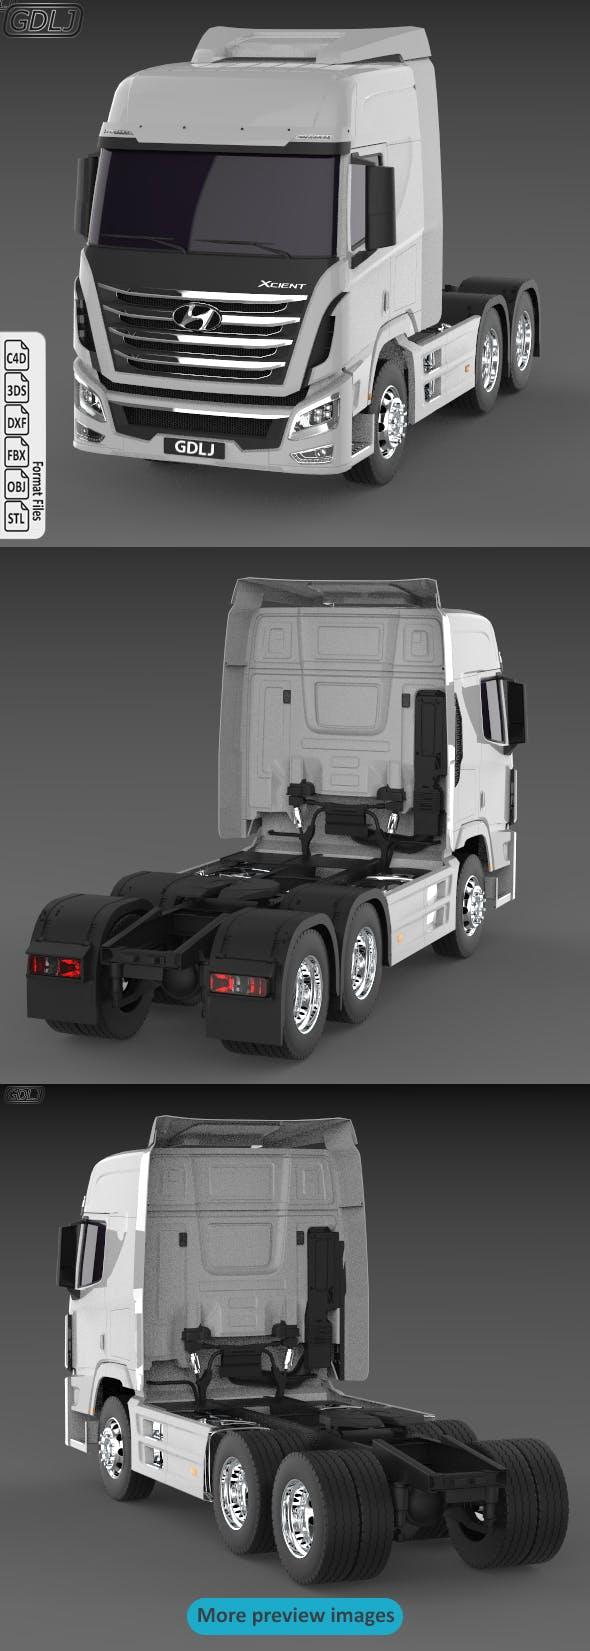 Hyundai Xcient - 3DOcean Item for Sale